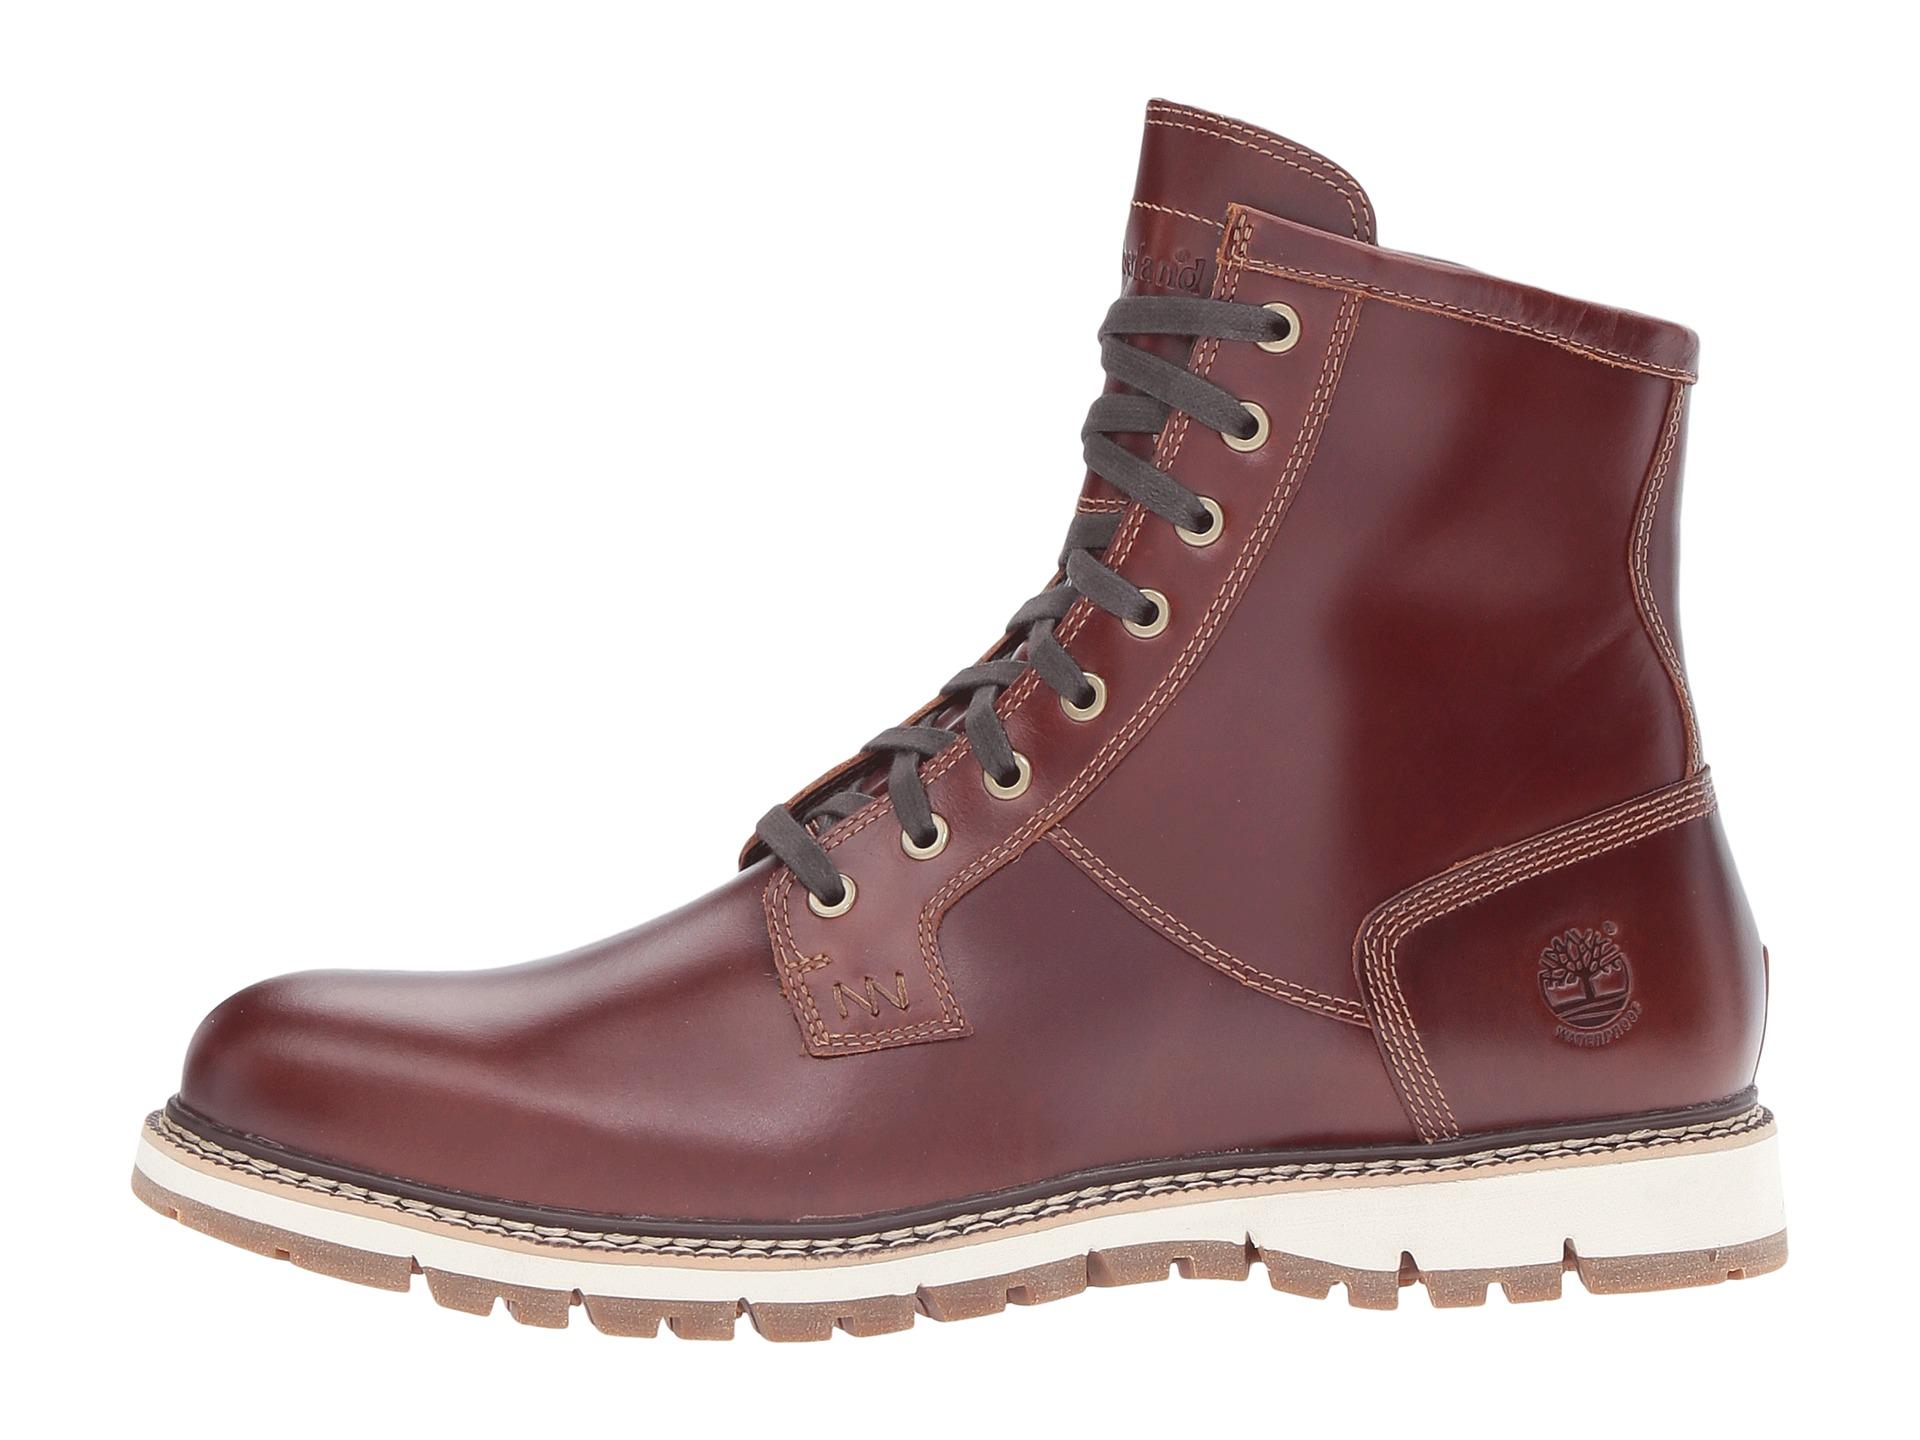 Timberland Britton Hill Waterproof Plain Toe Boot Zappos